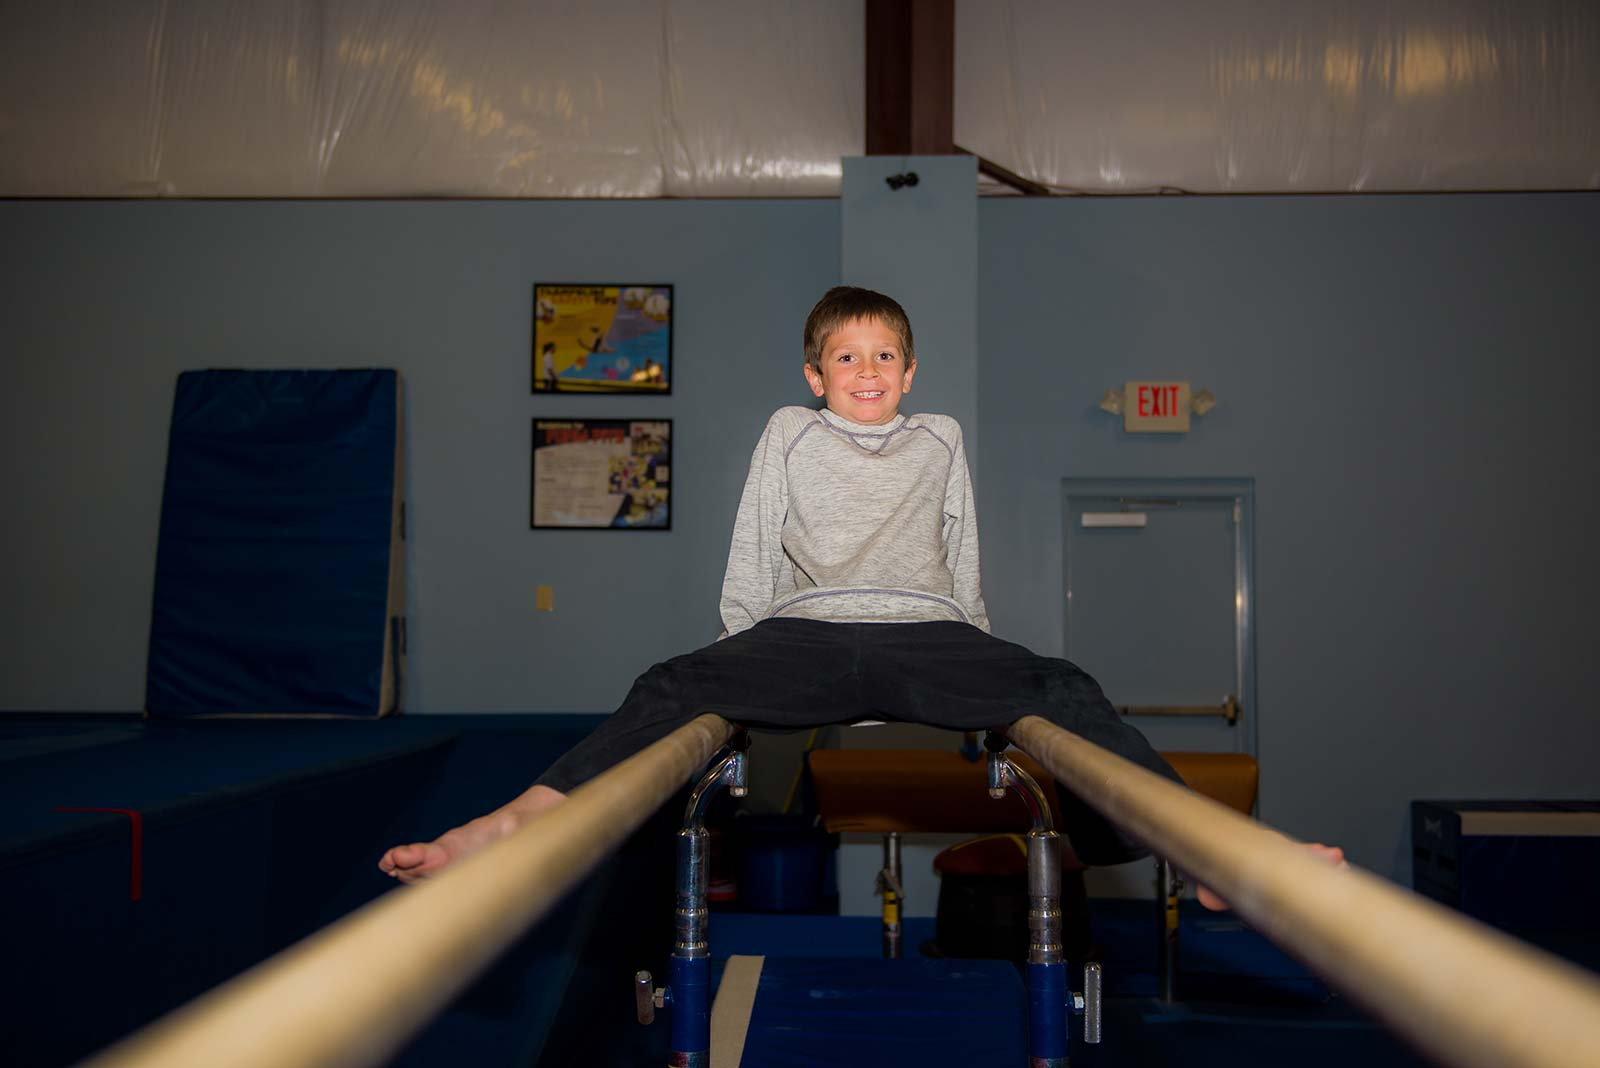 Boys Gymnastics Classes Louisville Gymnastics